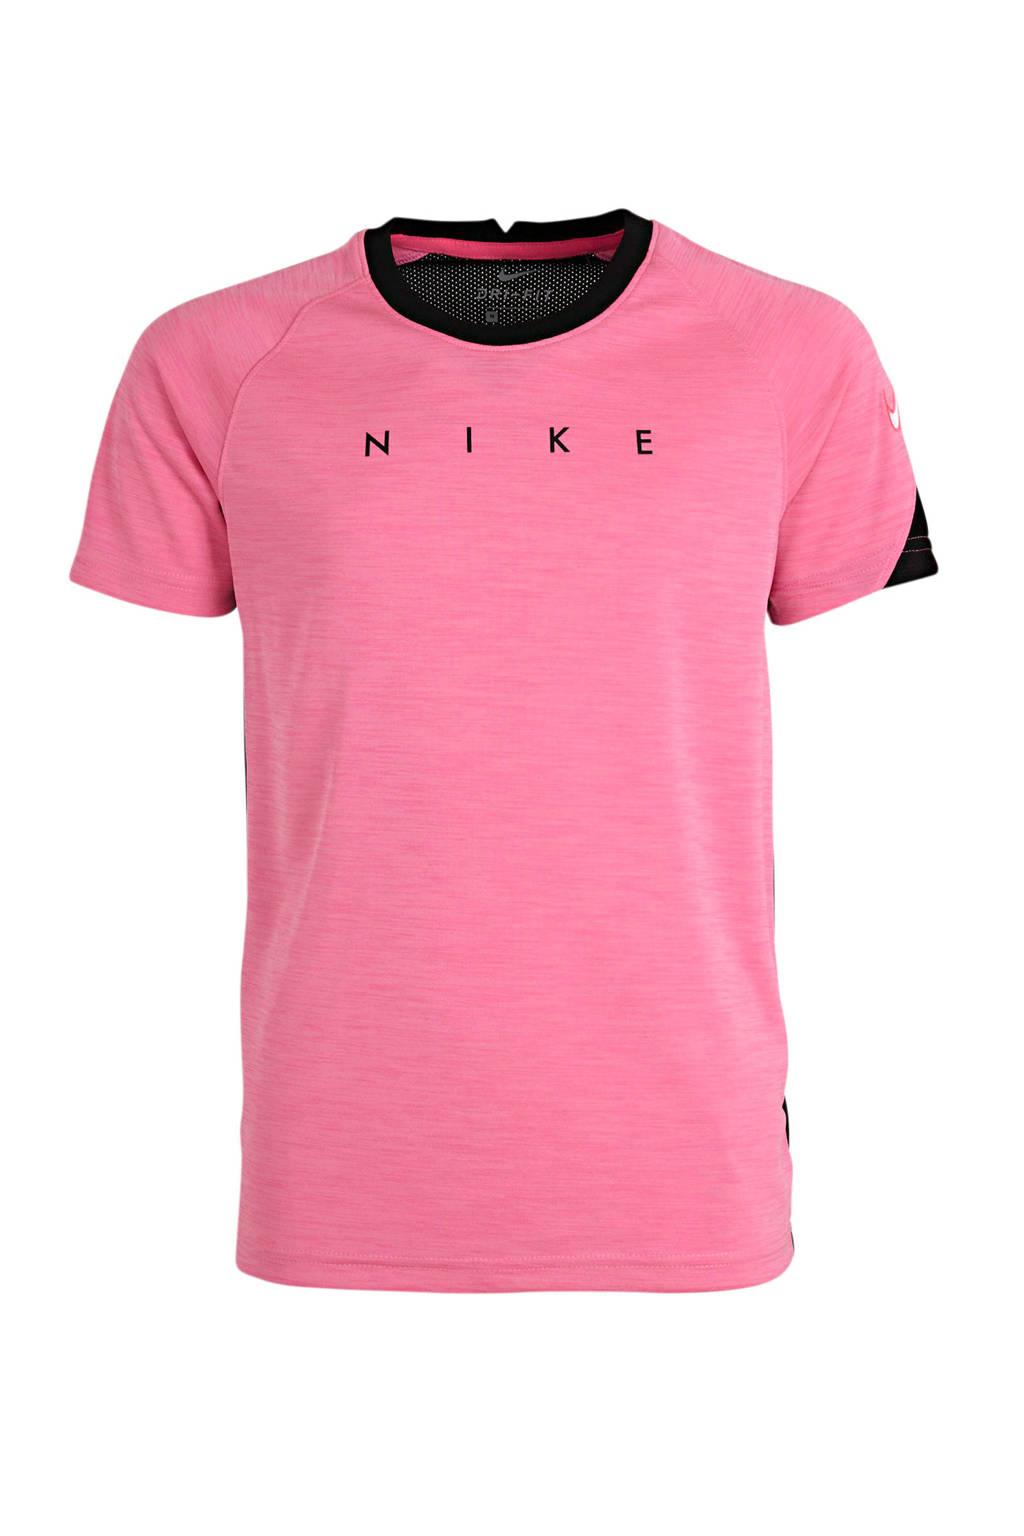 Nike Junior  voetbalshirt roze/zwart, Roze/zwart